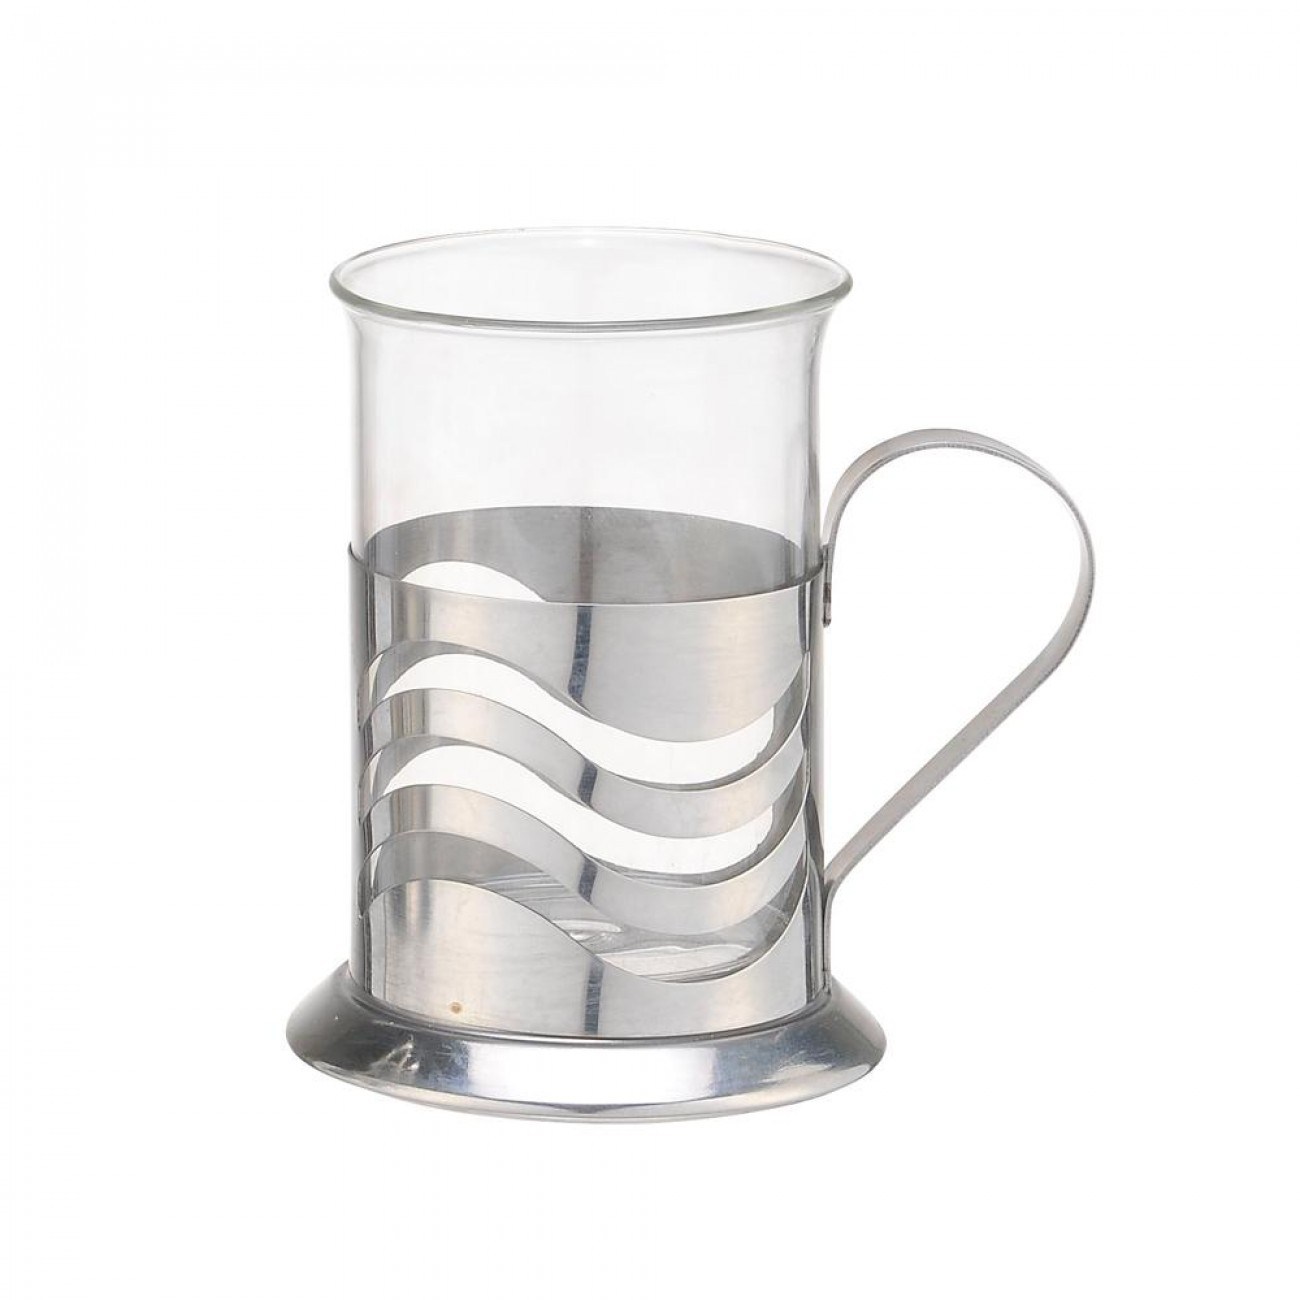 Комплект стъклени чаши SAPIR SP 1174 D200-2, 2 броя, 0.2 литра, Огнеупорно стъкло в Кафеварки за котлон - SAPIR | Alleop